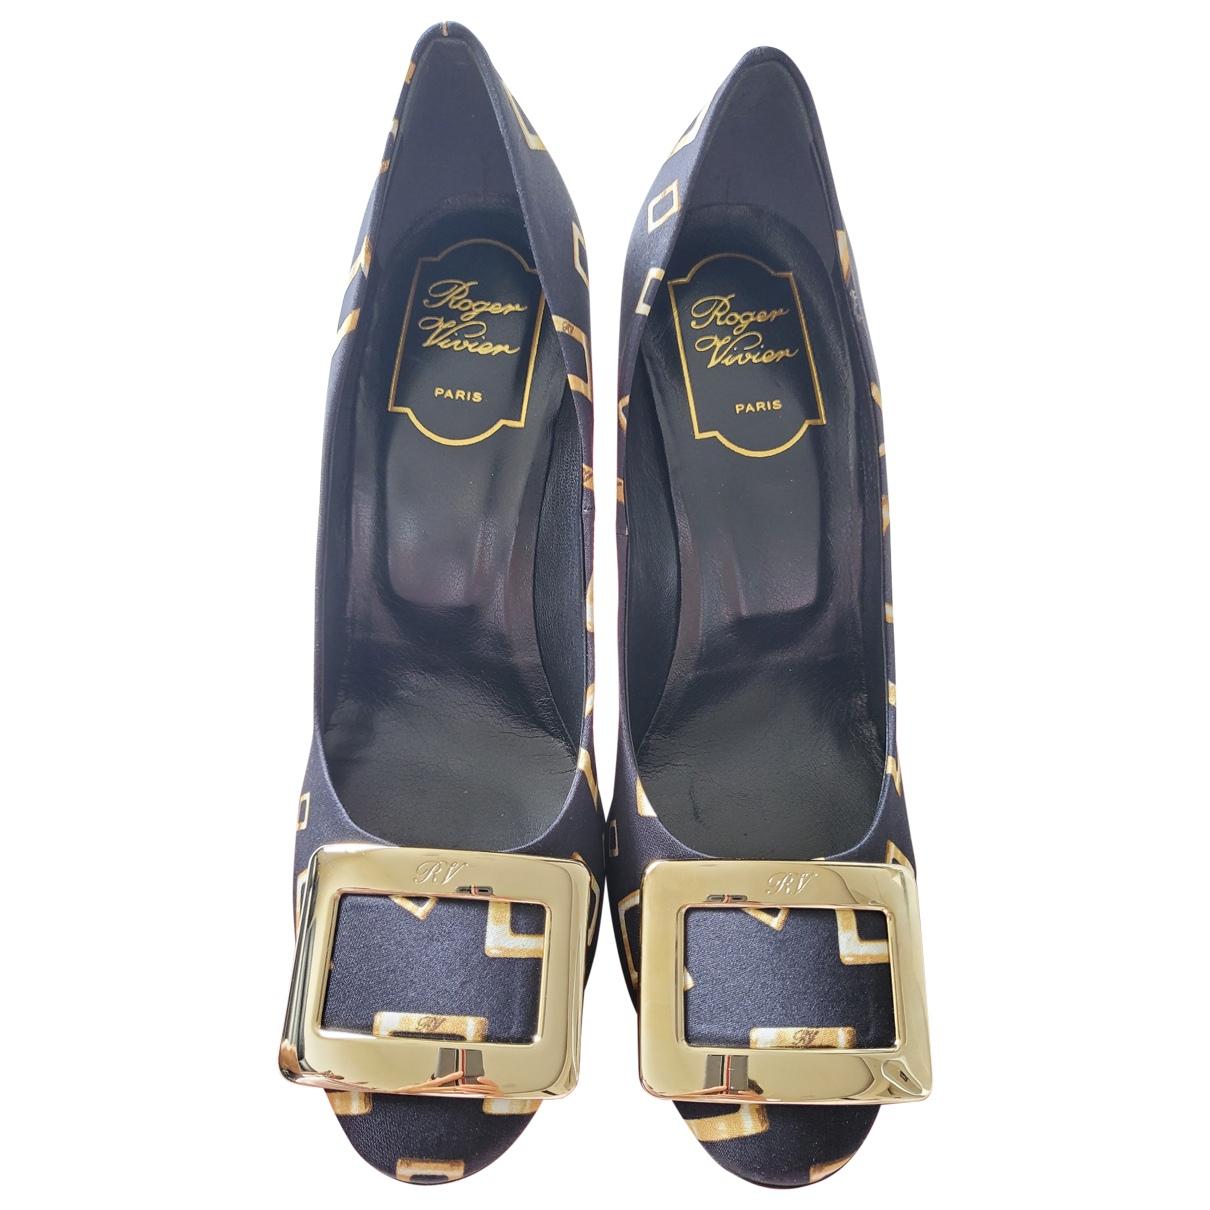 Roger Vivier Belle de Nuit Black Cloth Heels for Women 36.5 EU